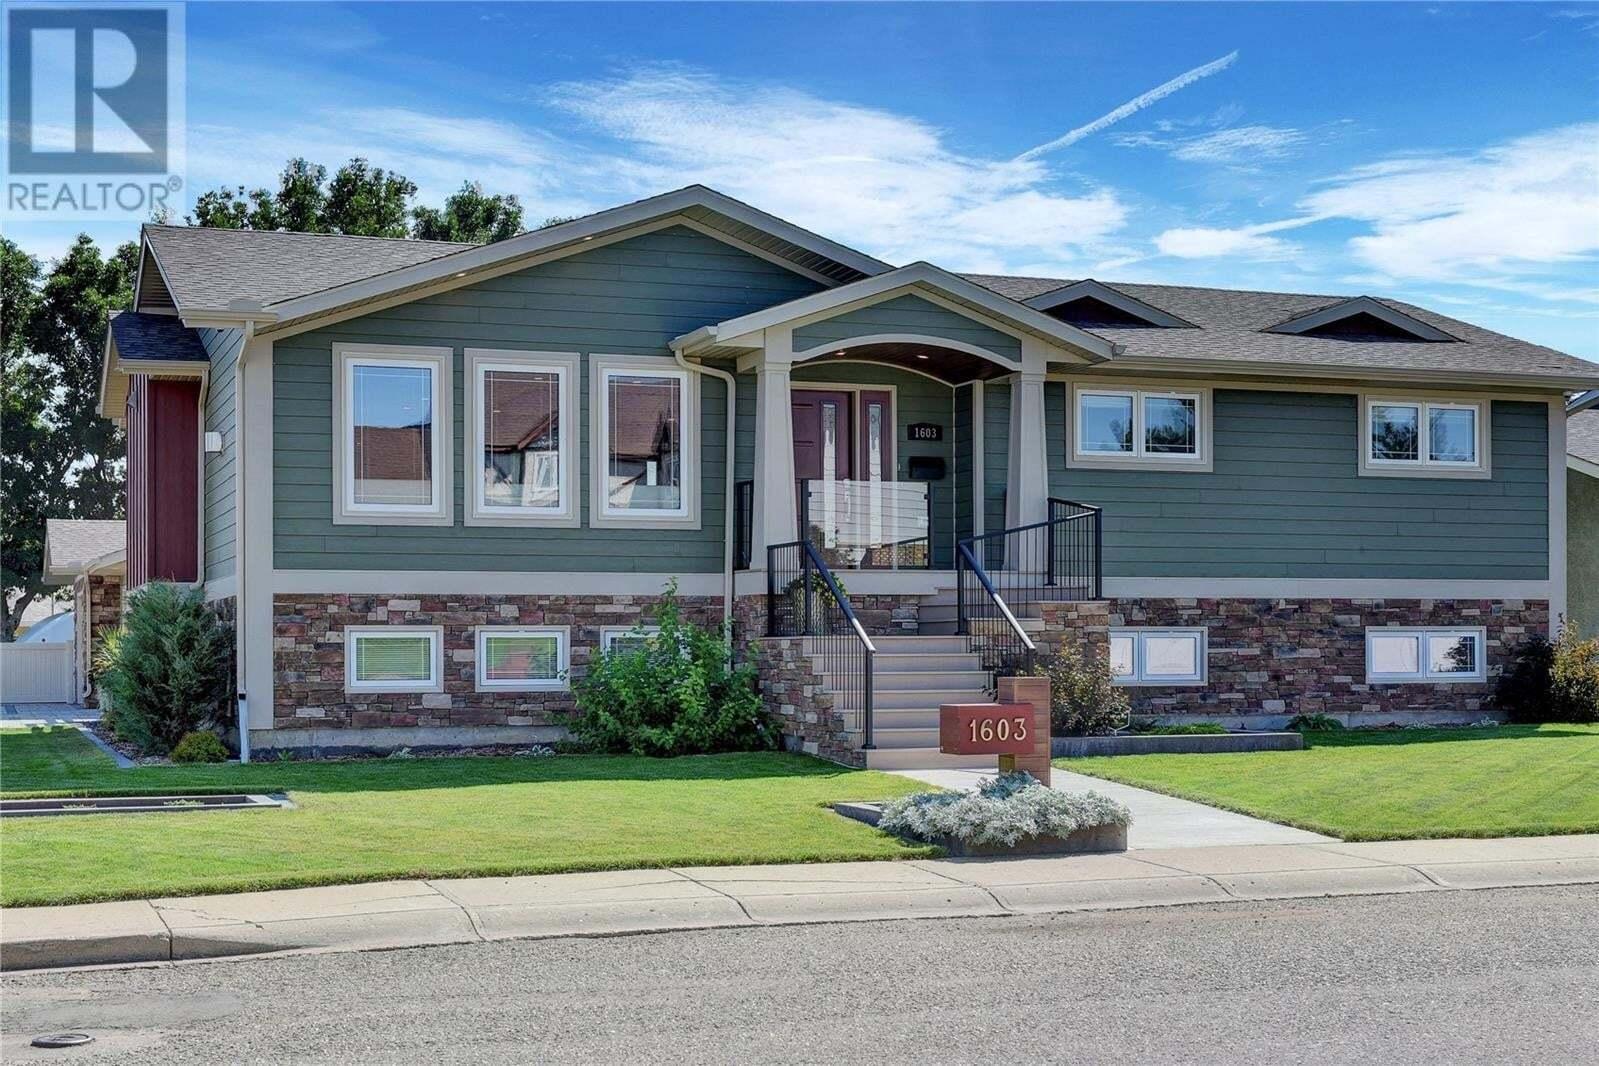 House for sale at 1603 Bingham Rd Moose Jaw Saskatchewan - MLS: SK819267